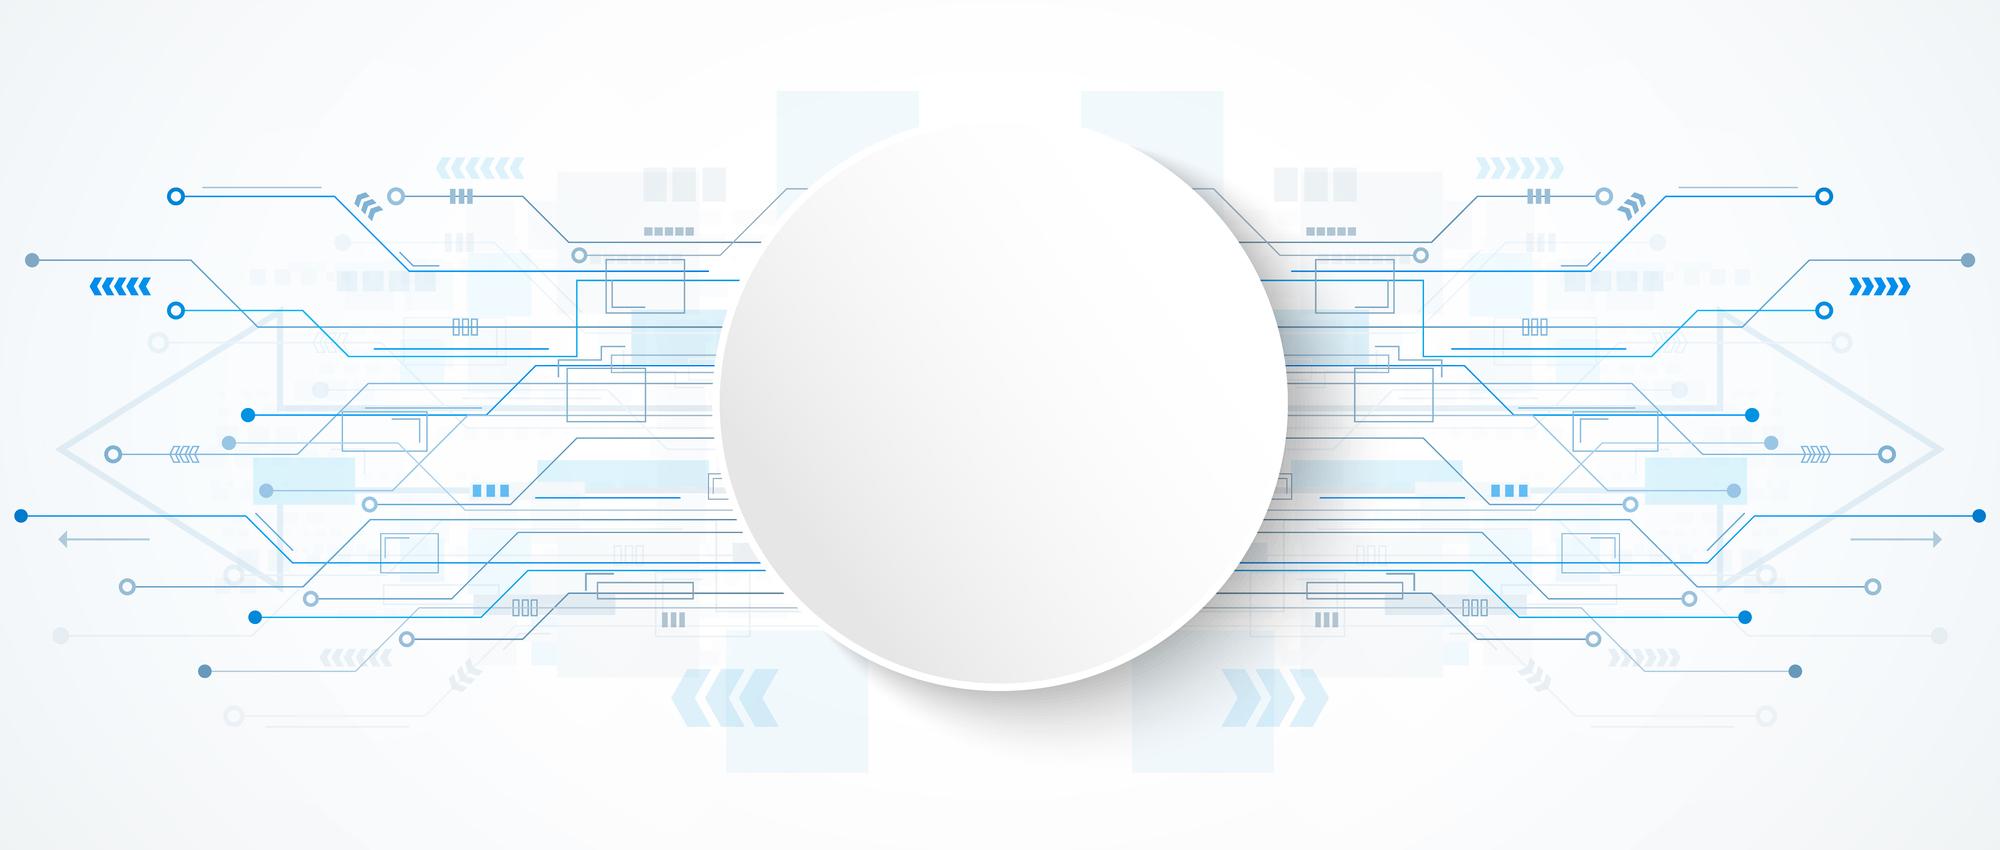 Magic xpi ノンコーディングで実現できる容易性と高生産性を体験してください